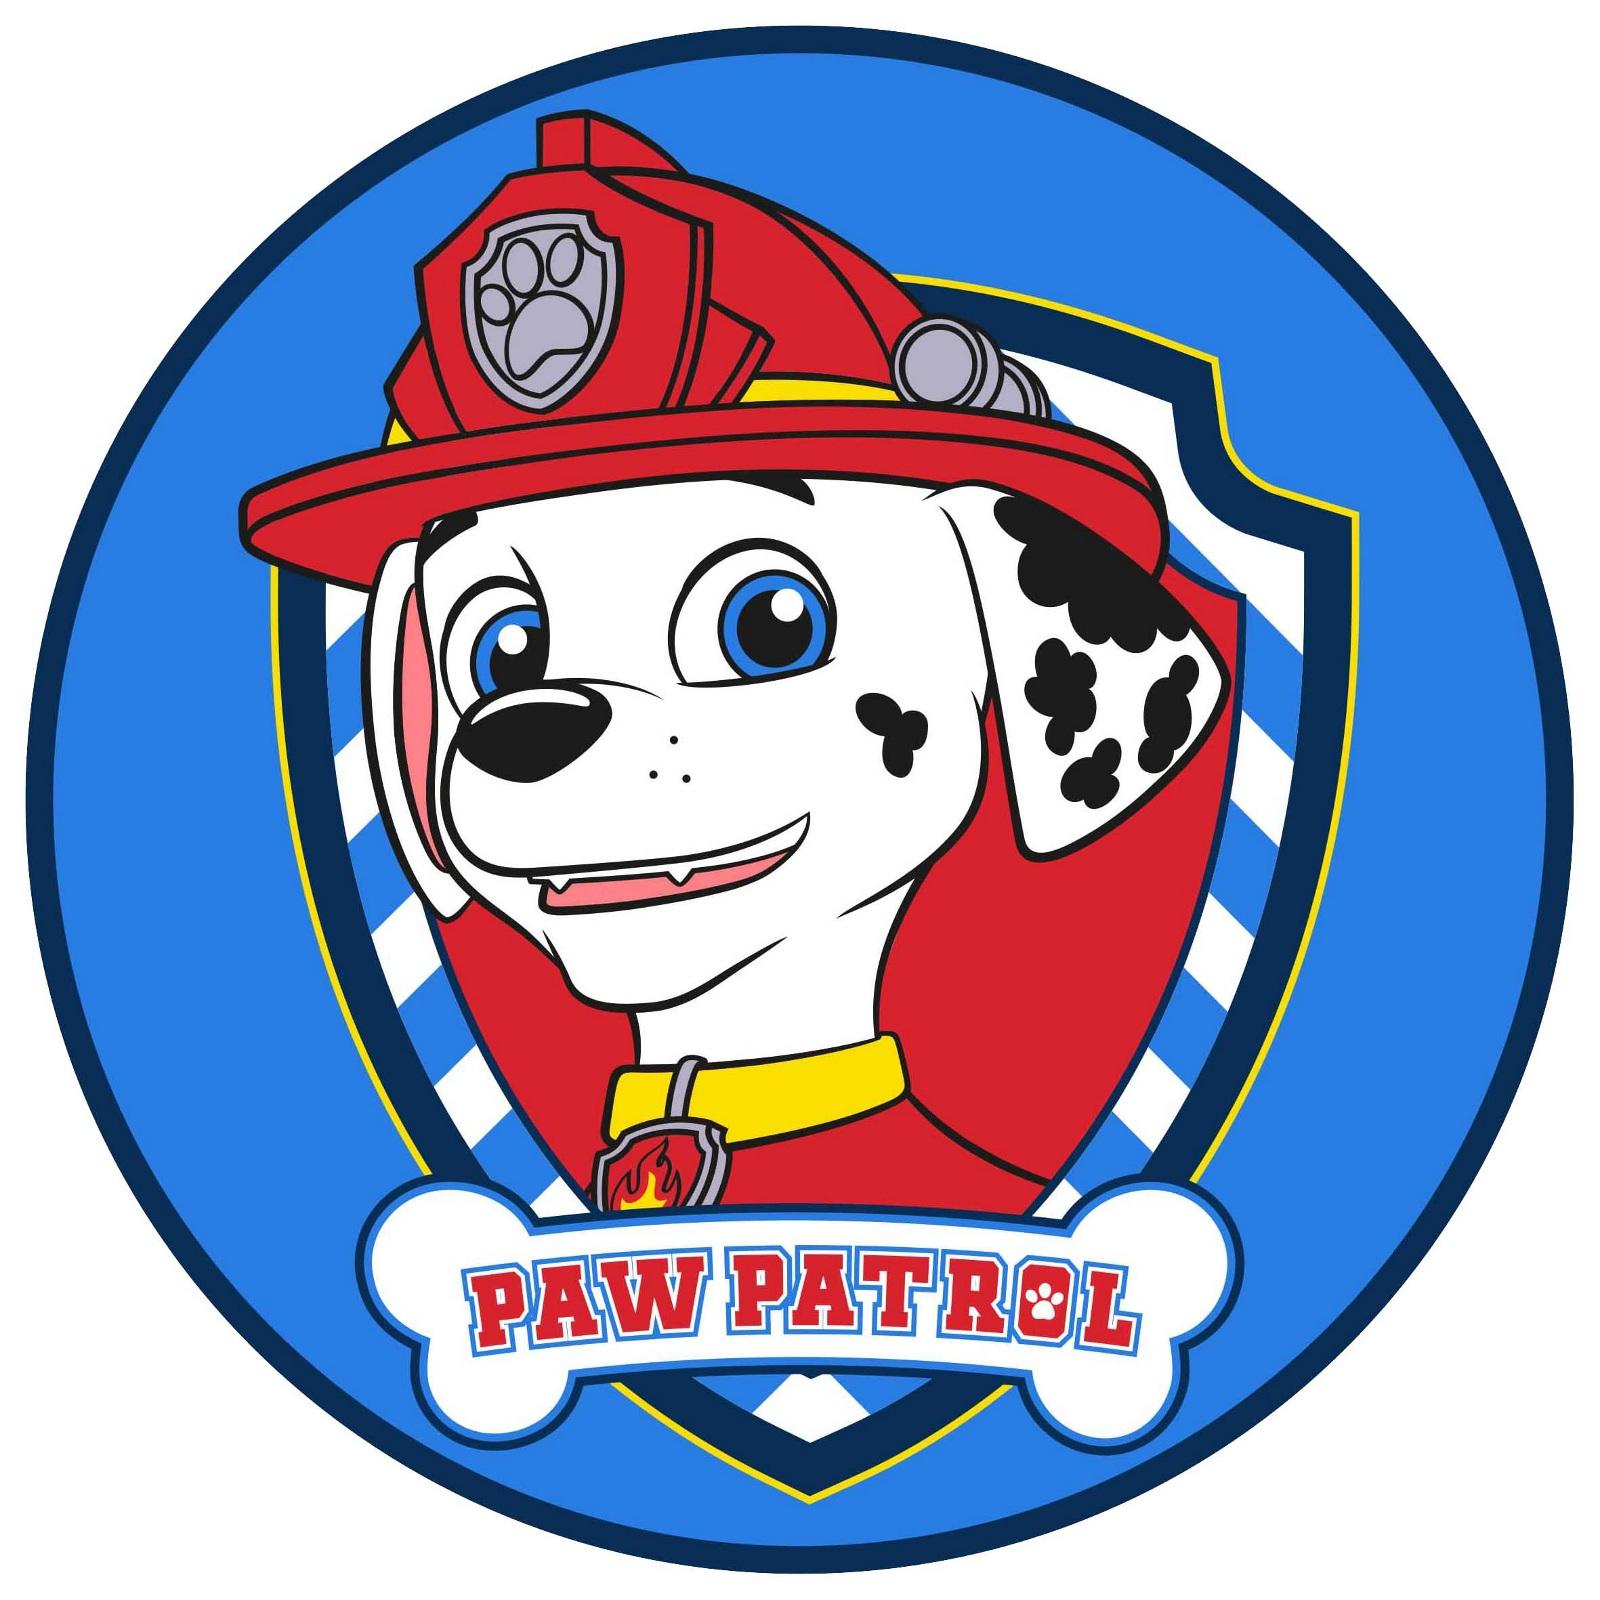 EXTRA LARGE New Paw Patrol Marshall Rug Floor Mat Kids Boys